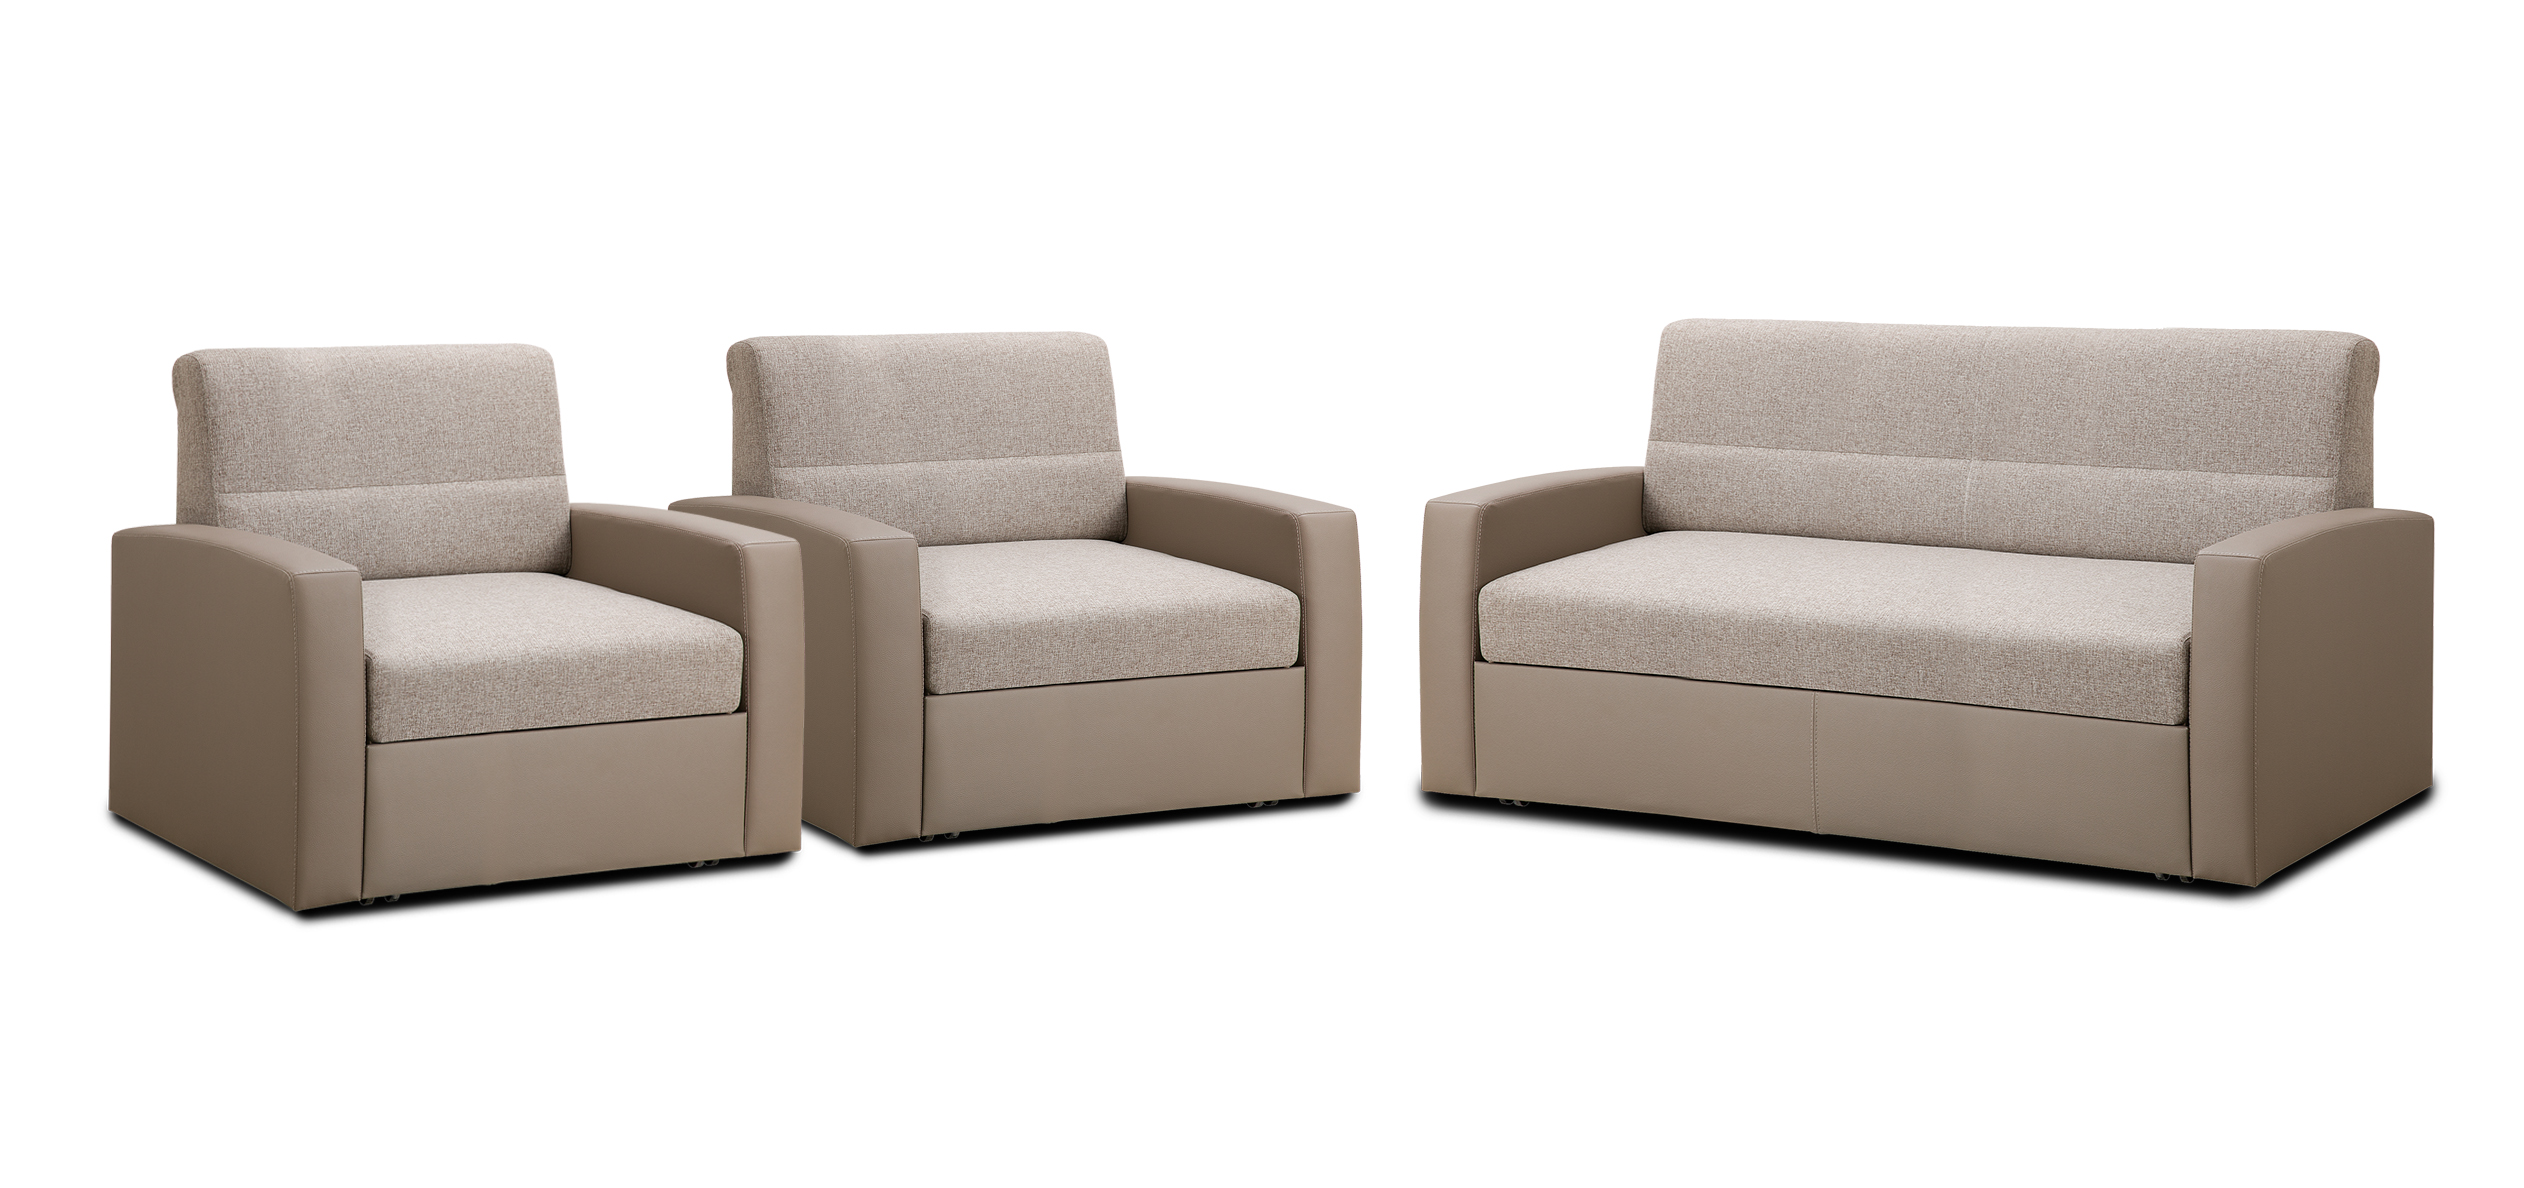 Комплект мягкой мебели Конрад